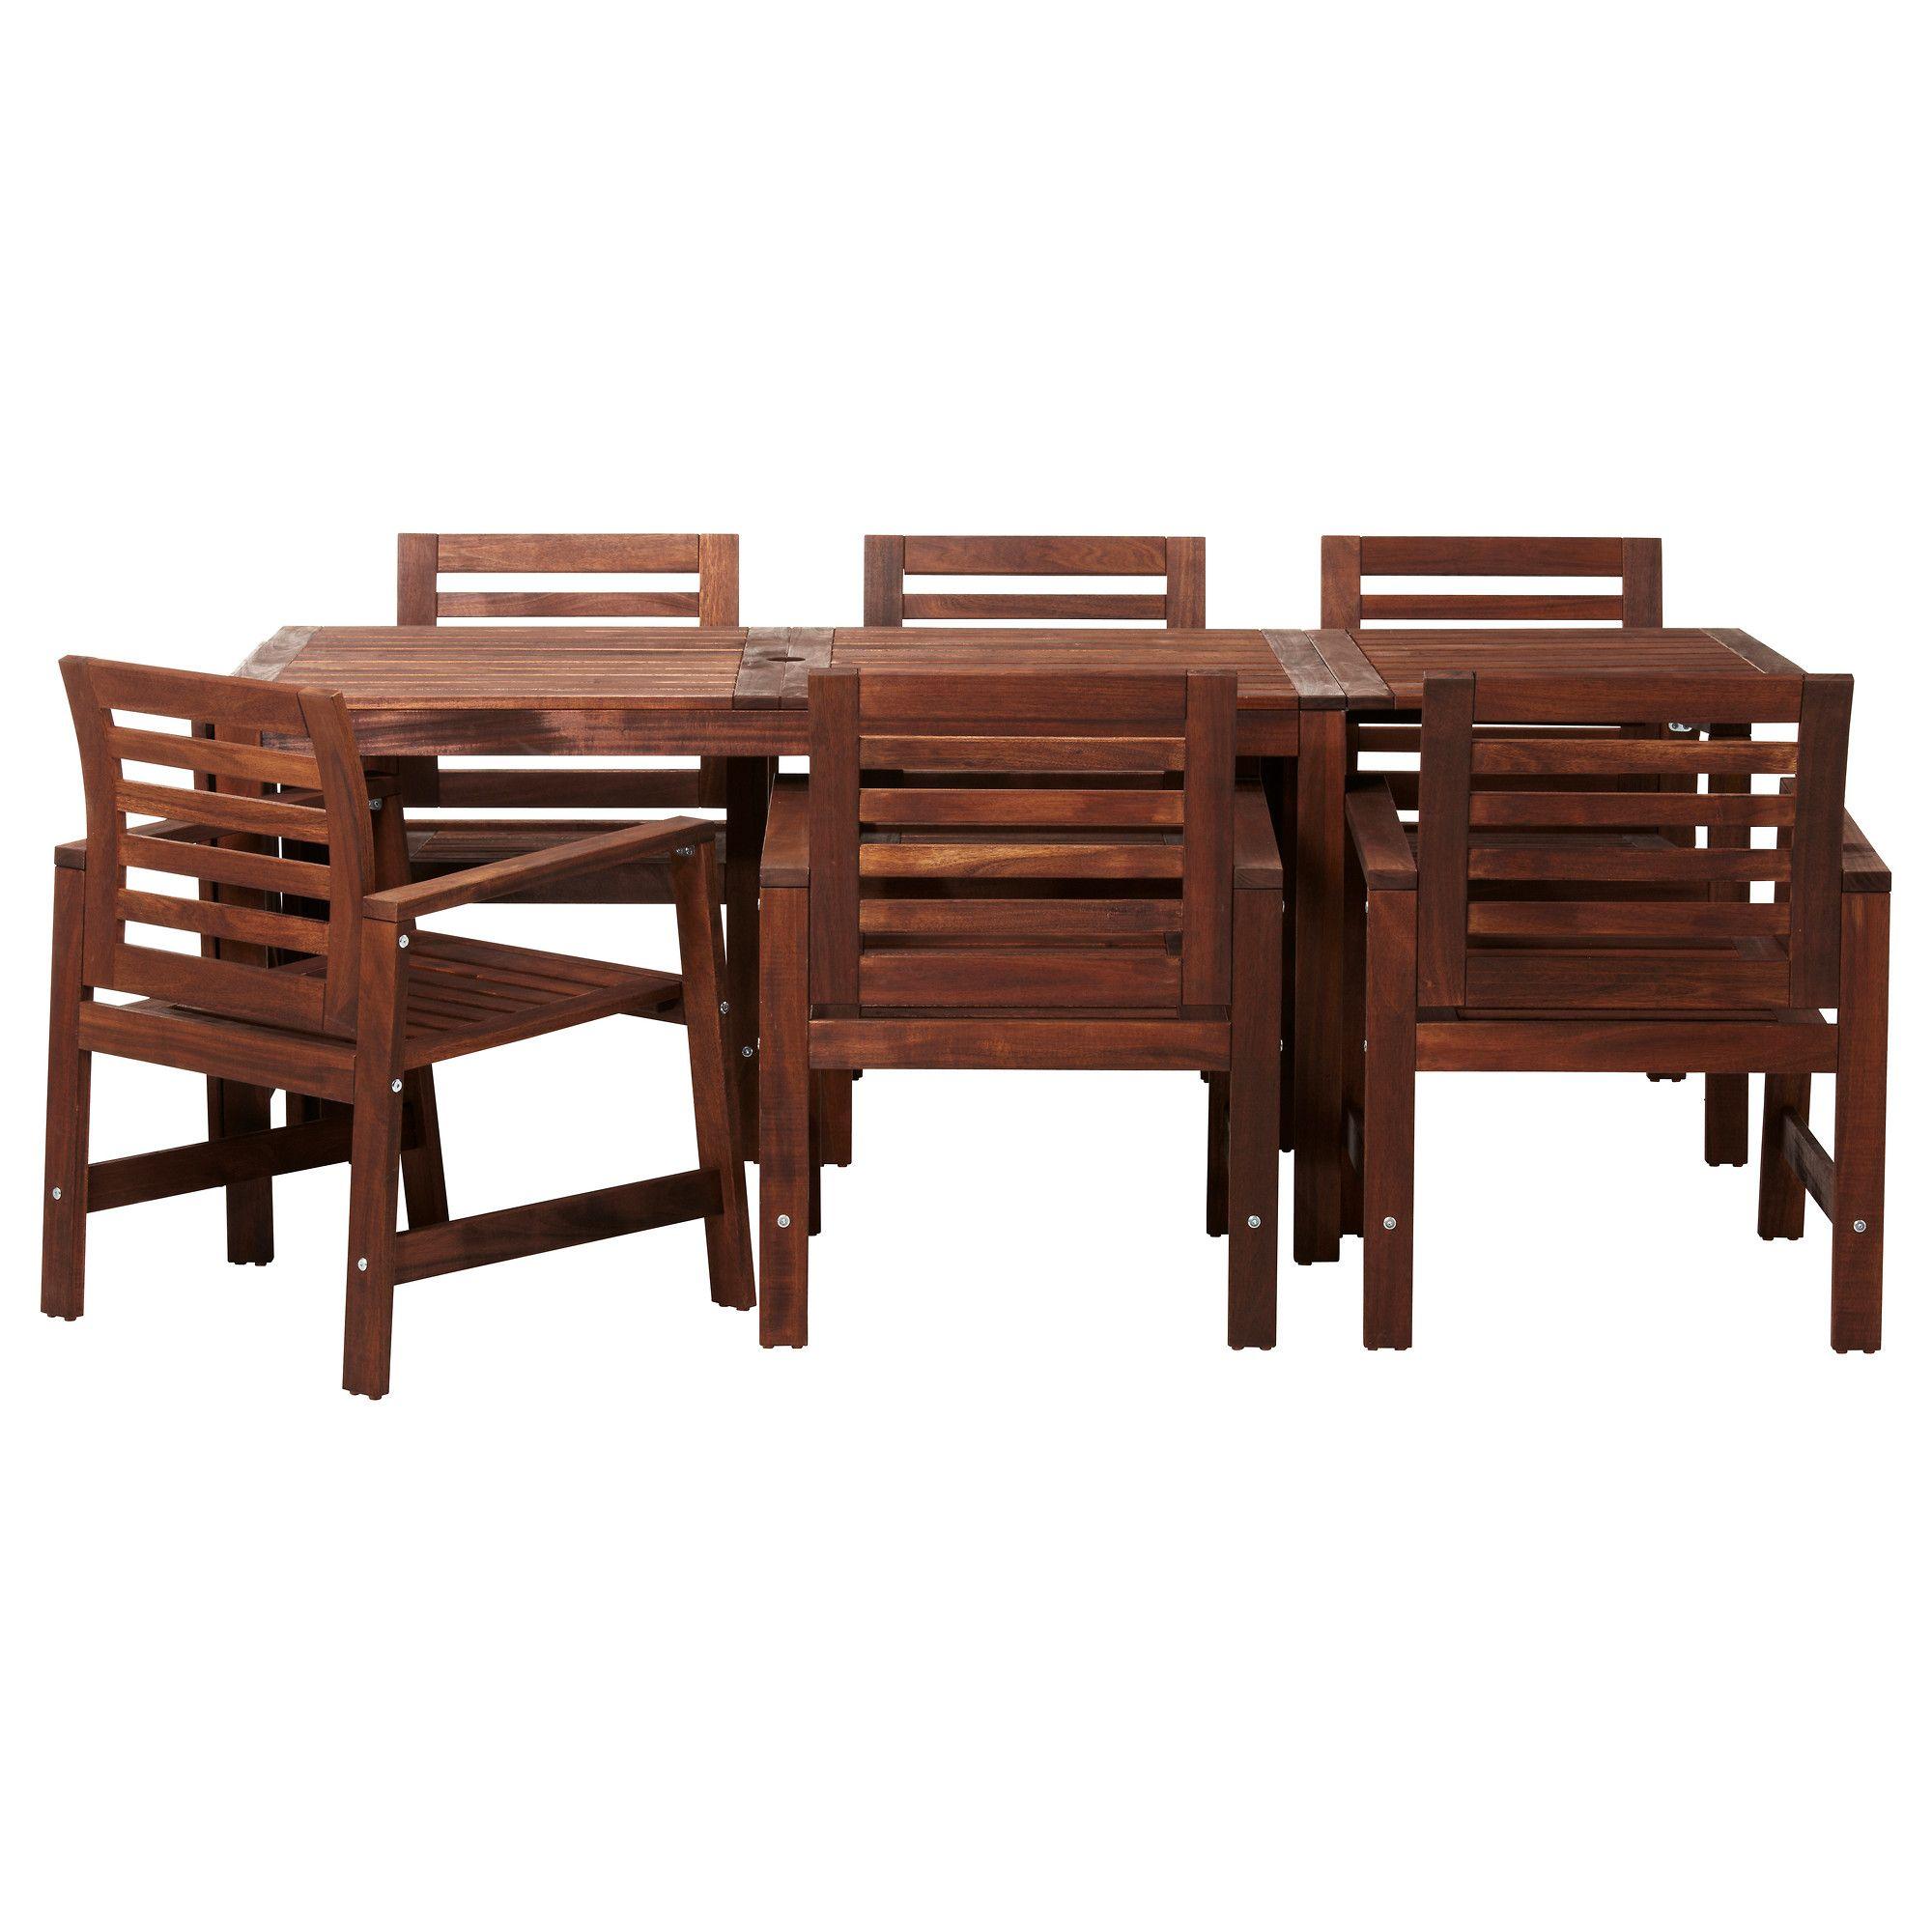 ÄPPLARÖ Mesa+6sill reposabr ext, tinte marrón marrón | Ikea, Sillas ...